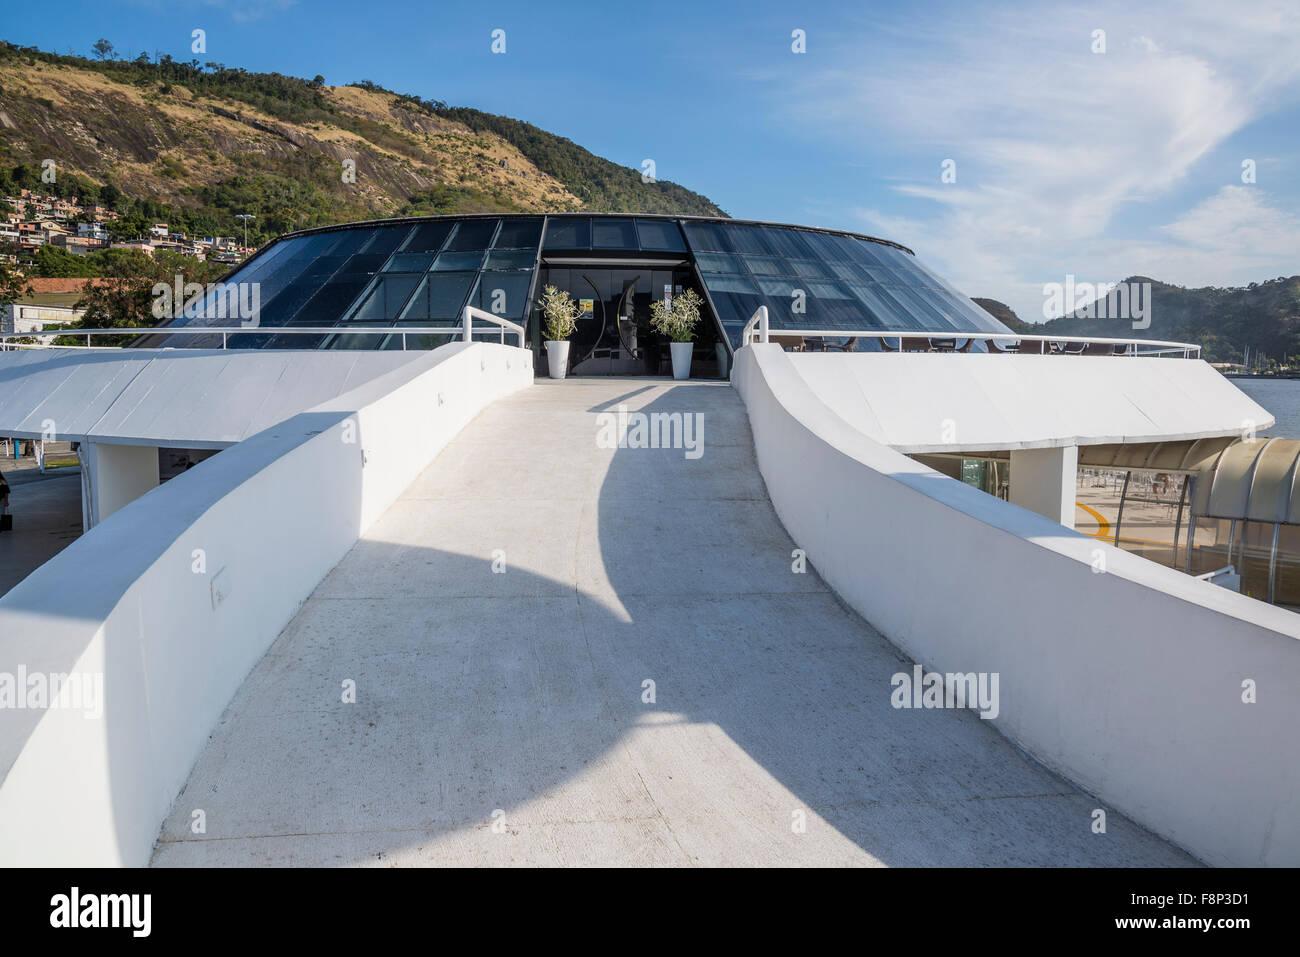 Waterways of Charitas station, Niteroi, Rio de Janeiro, Brazil - Stock Image